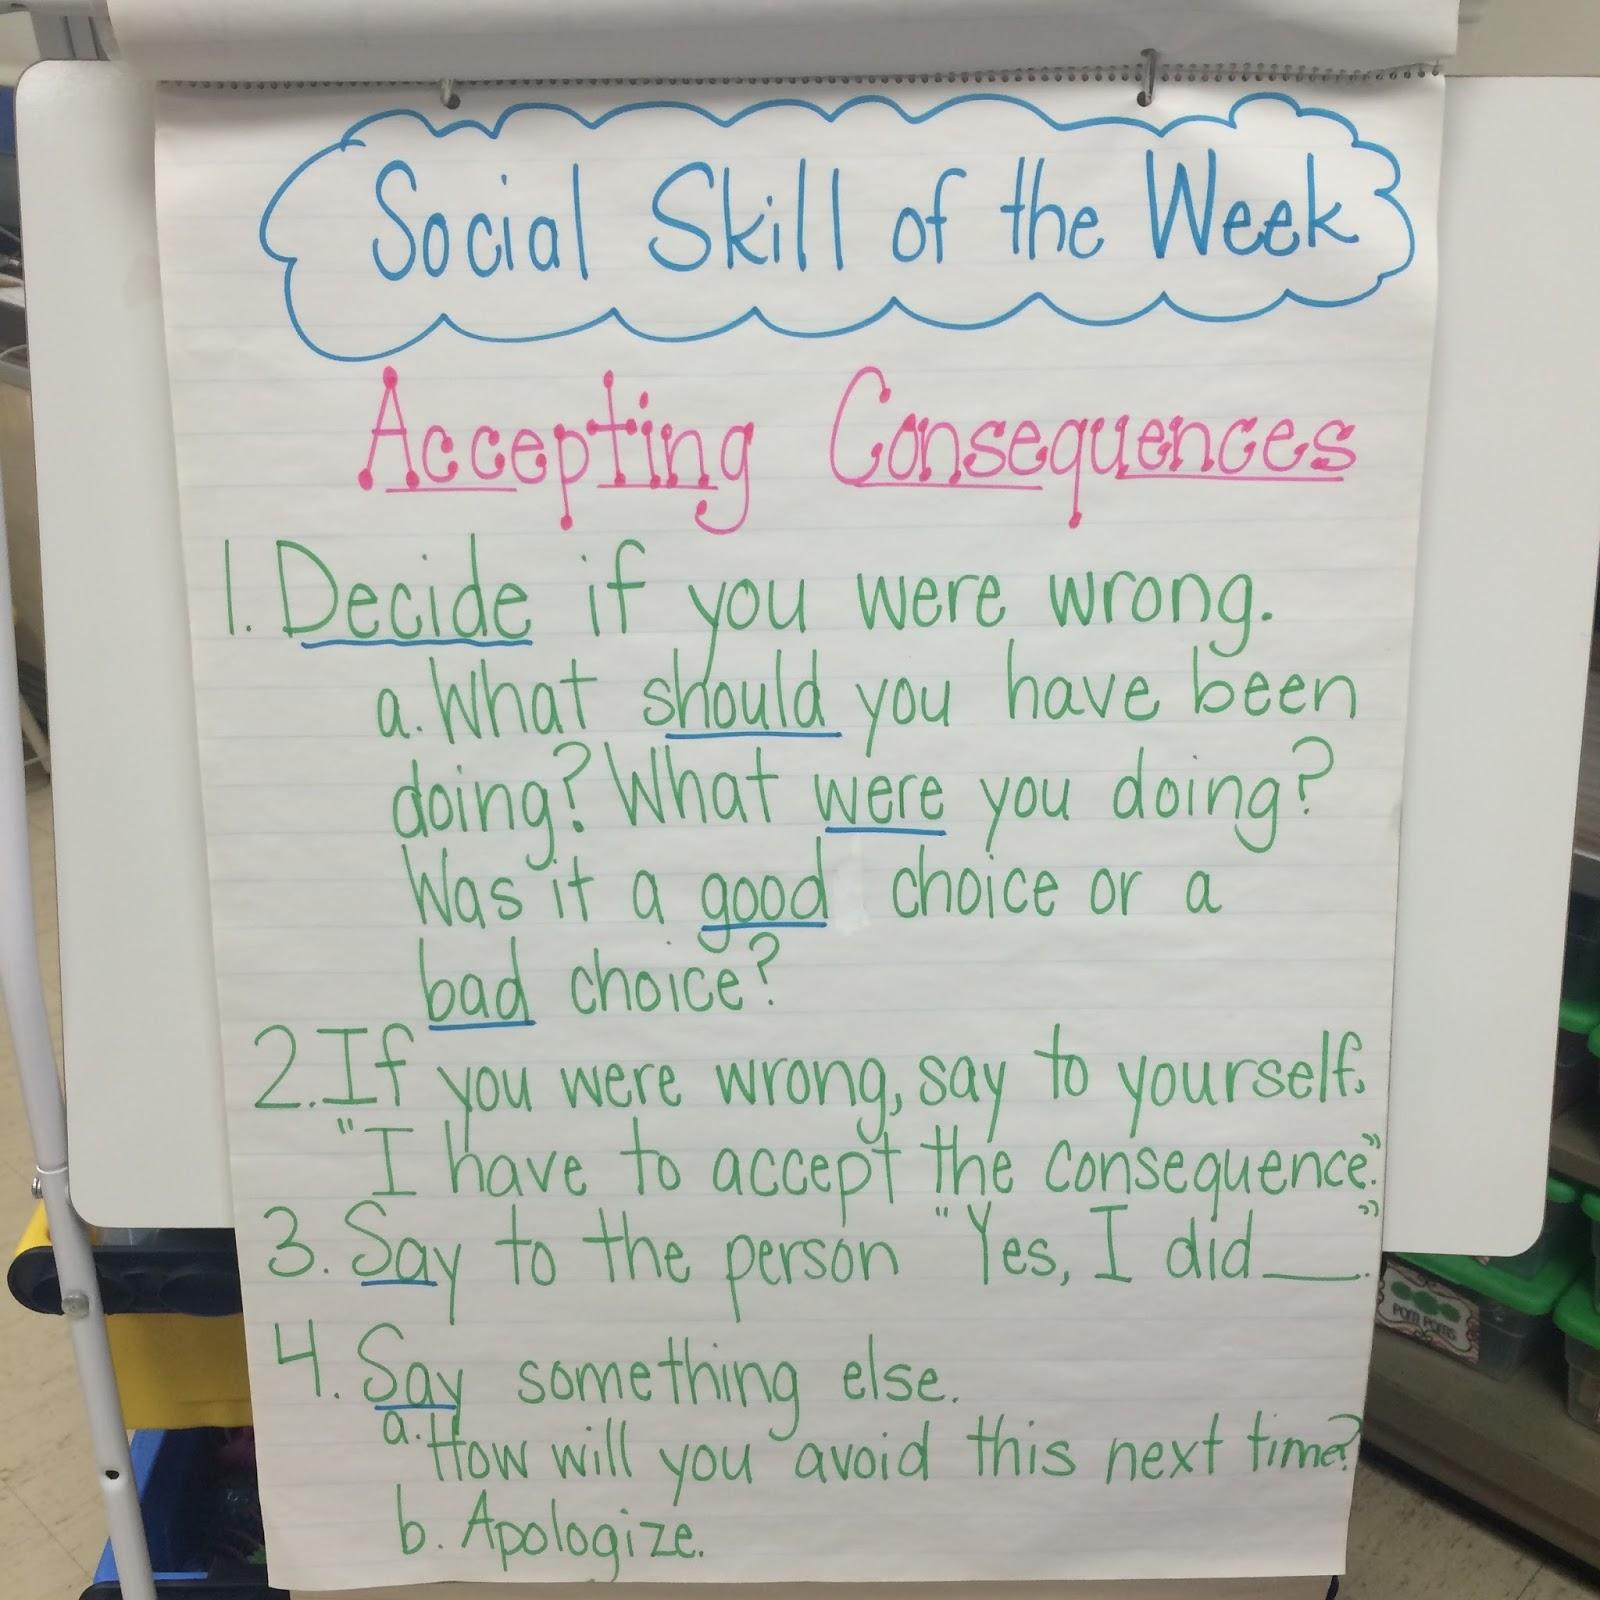 Teaching Social Skills in an Elementary Class